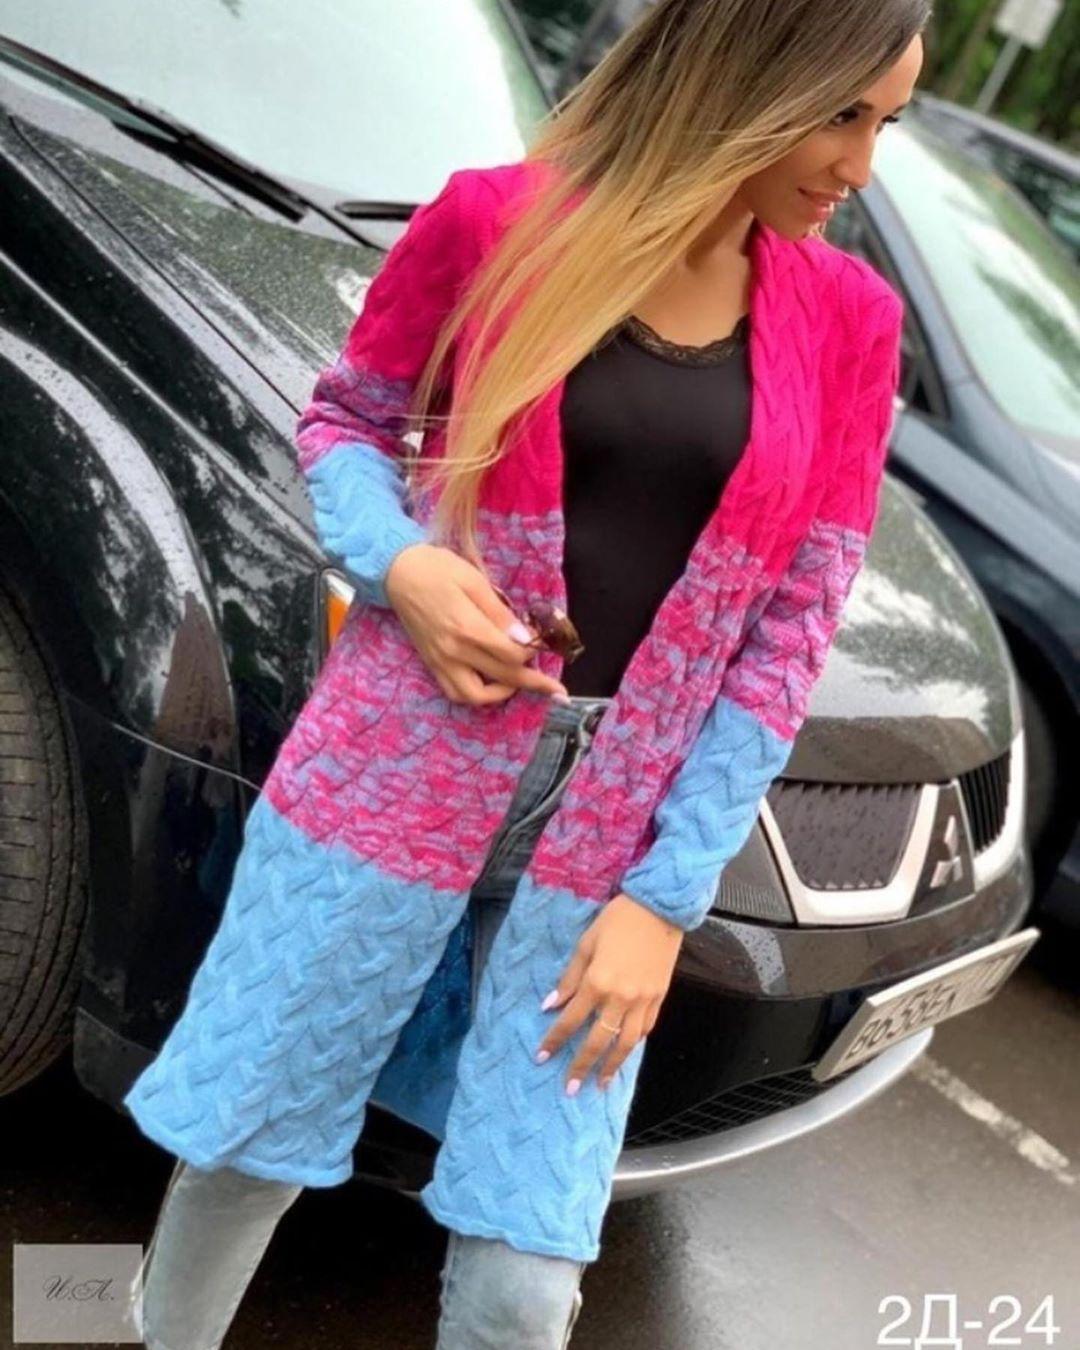 750 руб 42-52 #sale_room#мода2020#fashion#style#shopping#fashion#style#шоурум#стильномодномолодежно#наряд#инстамода#style#женскаяодежда#beautiful#instagood#design#model#dress#shoes#heels#follower#styles#интернетмагазин#шоппингонлайн#стиль#выгодныецены#красиваяодежда#одежданазаказказань#